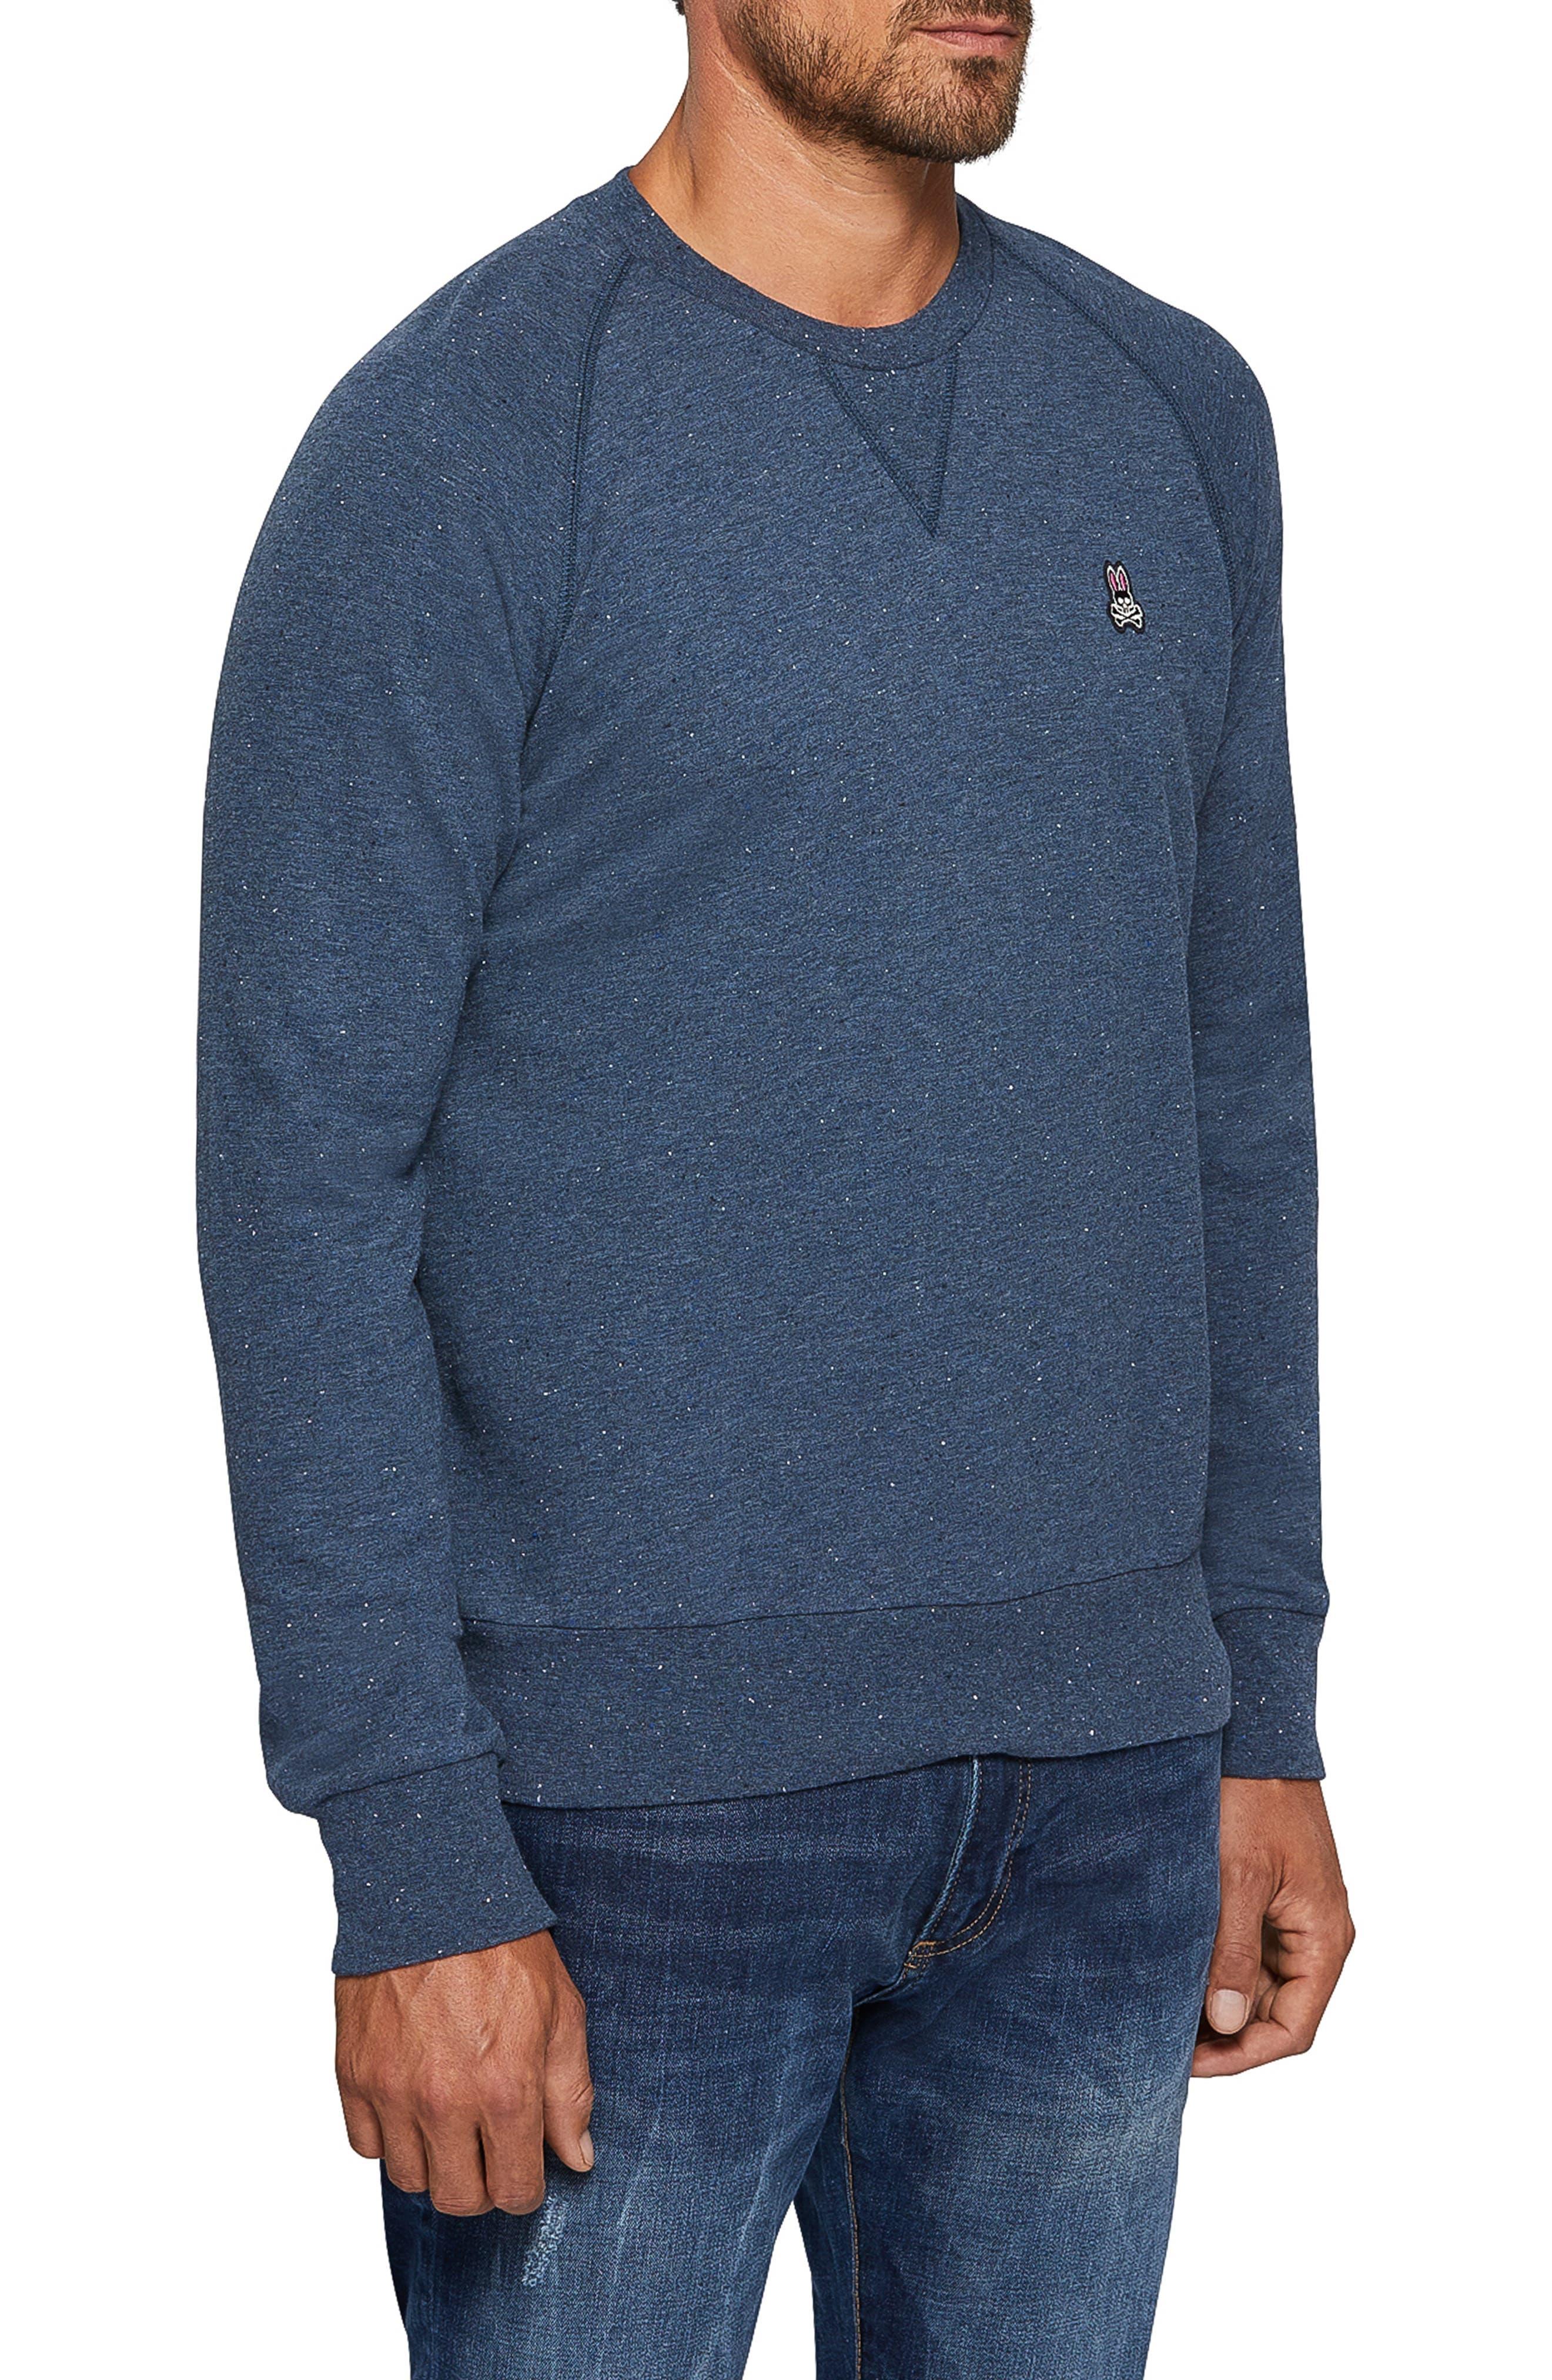 Larne Donegal Crewneck Sweatshirt,                             Alternate thumbnail 3, color,                             GULF